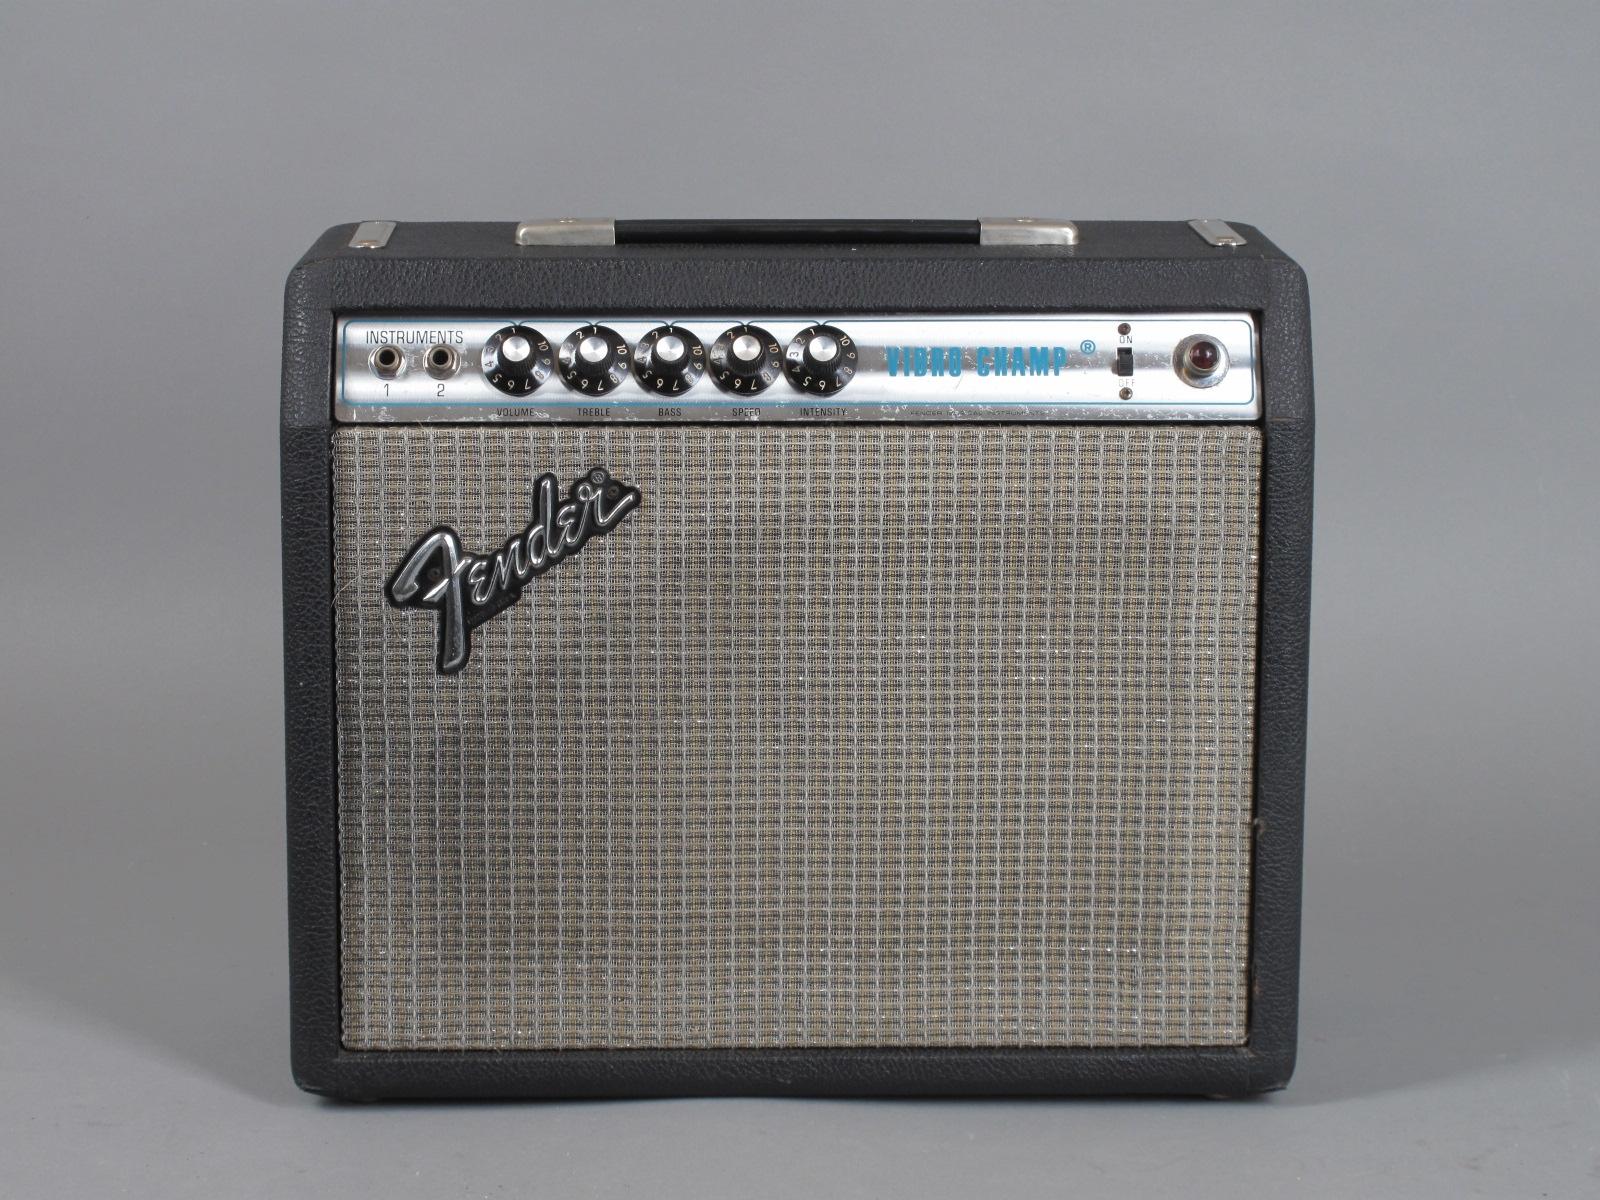 1980s Fender Vibro Champ Amplifier